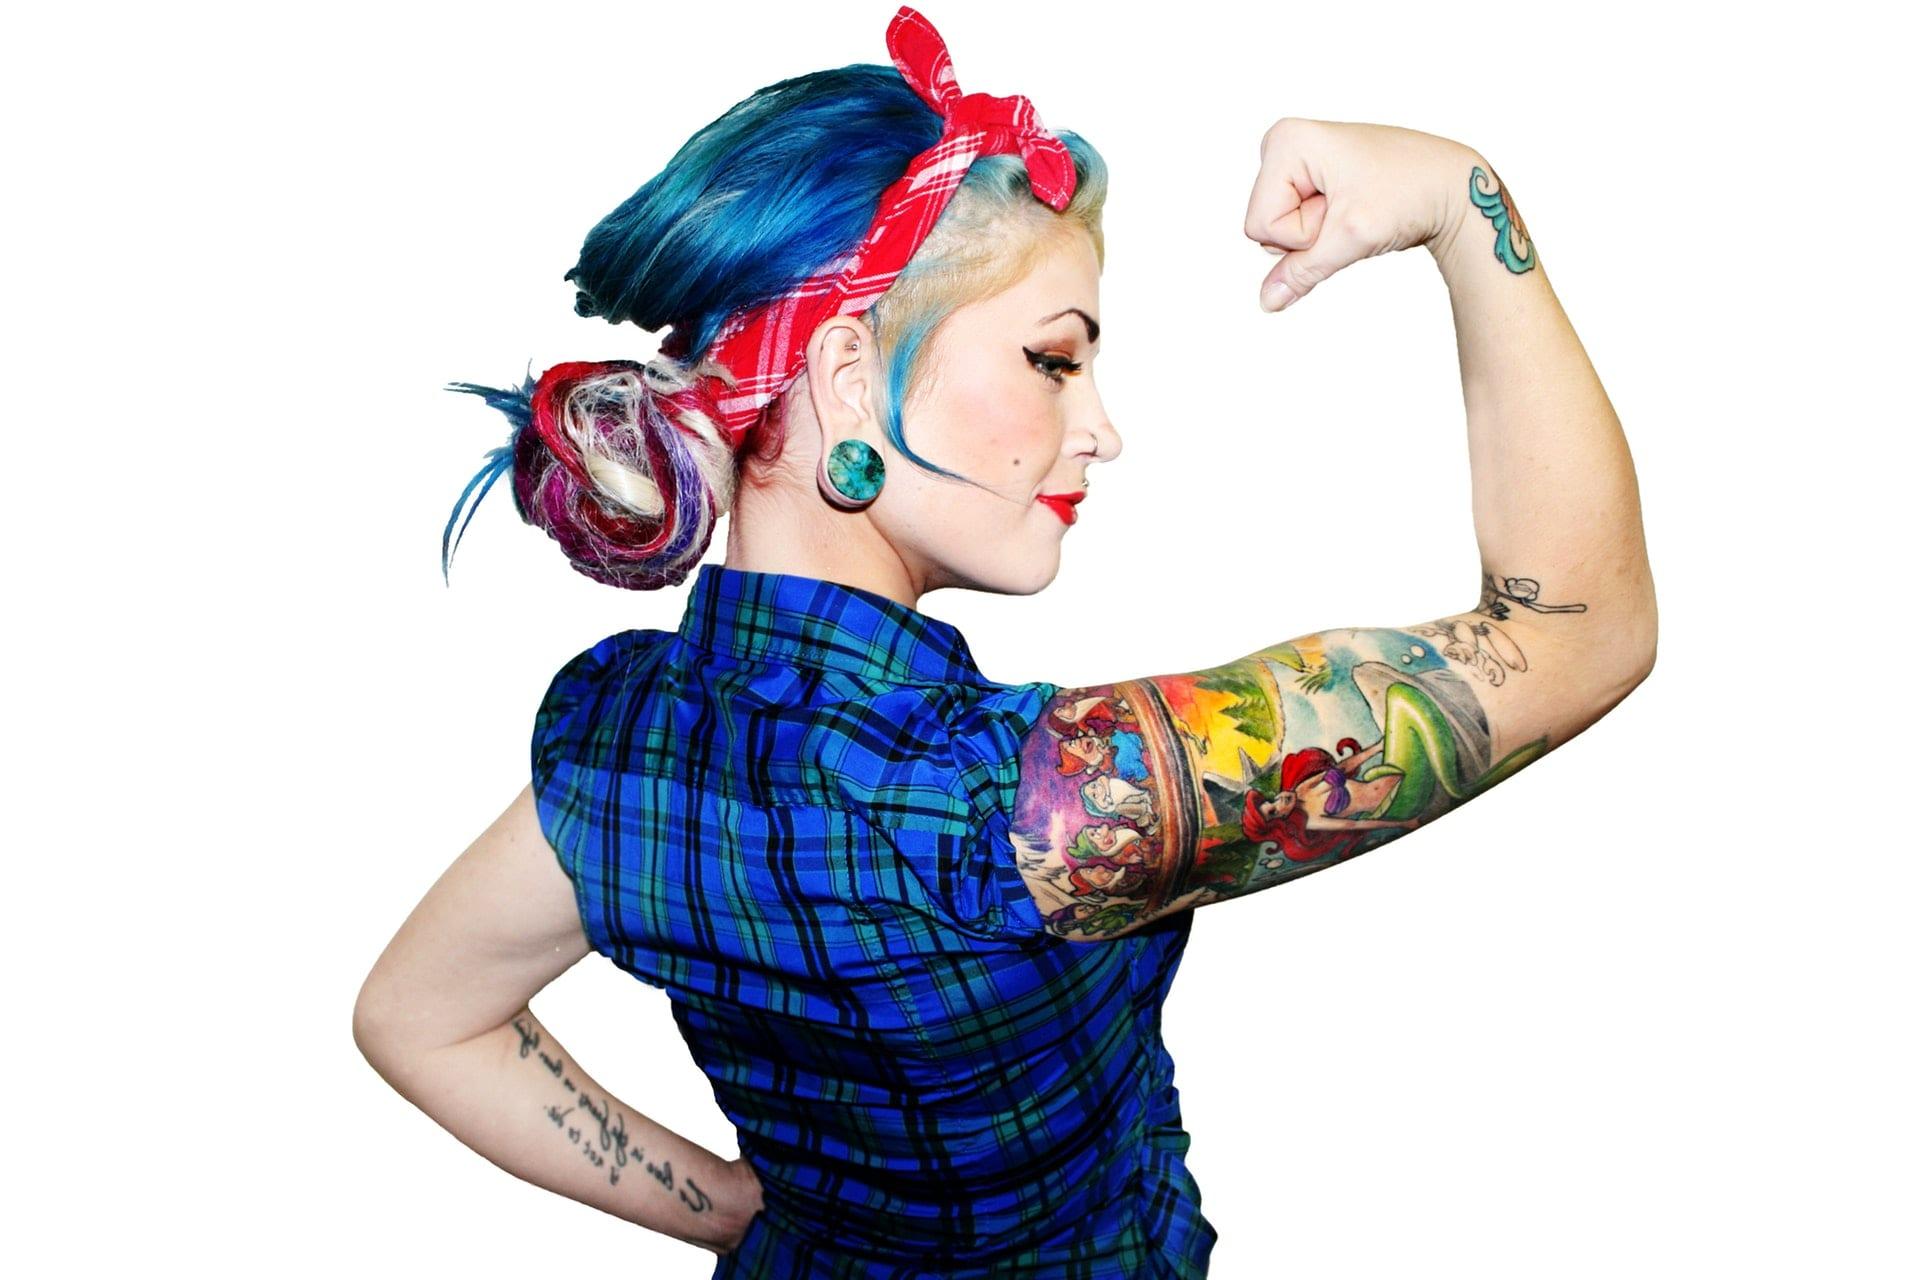 Catalogo Tattoo 2017 the 9 best tattoo shops in columbus